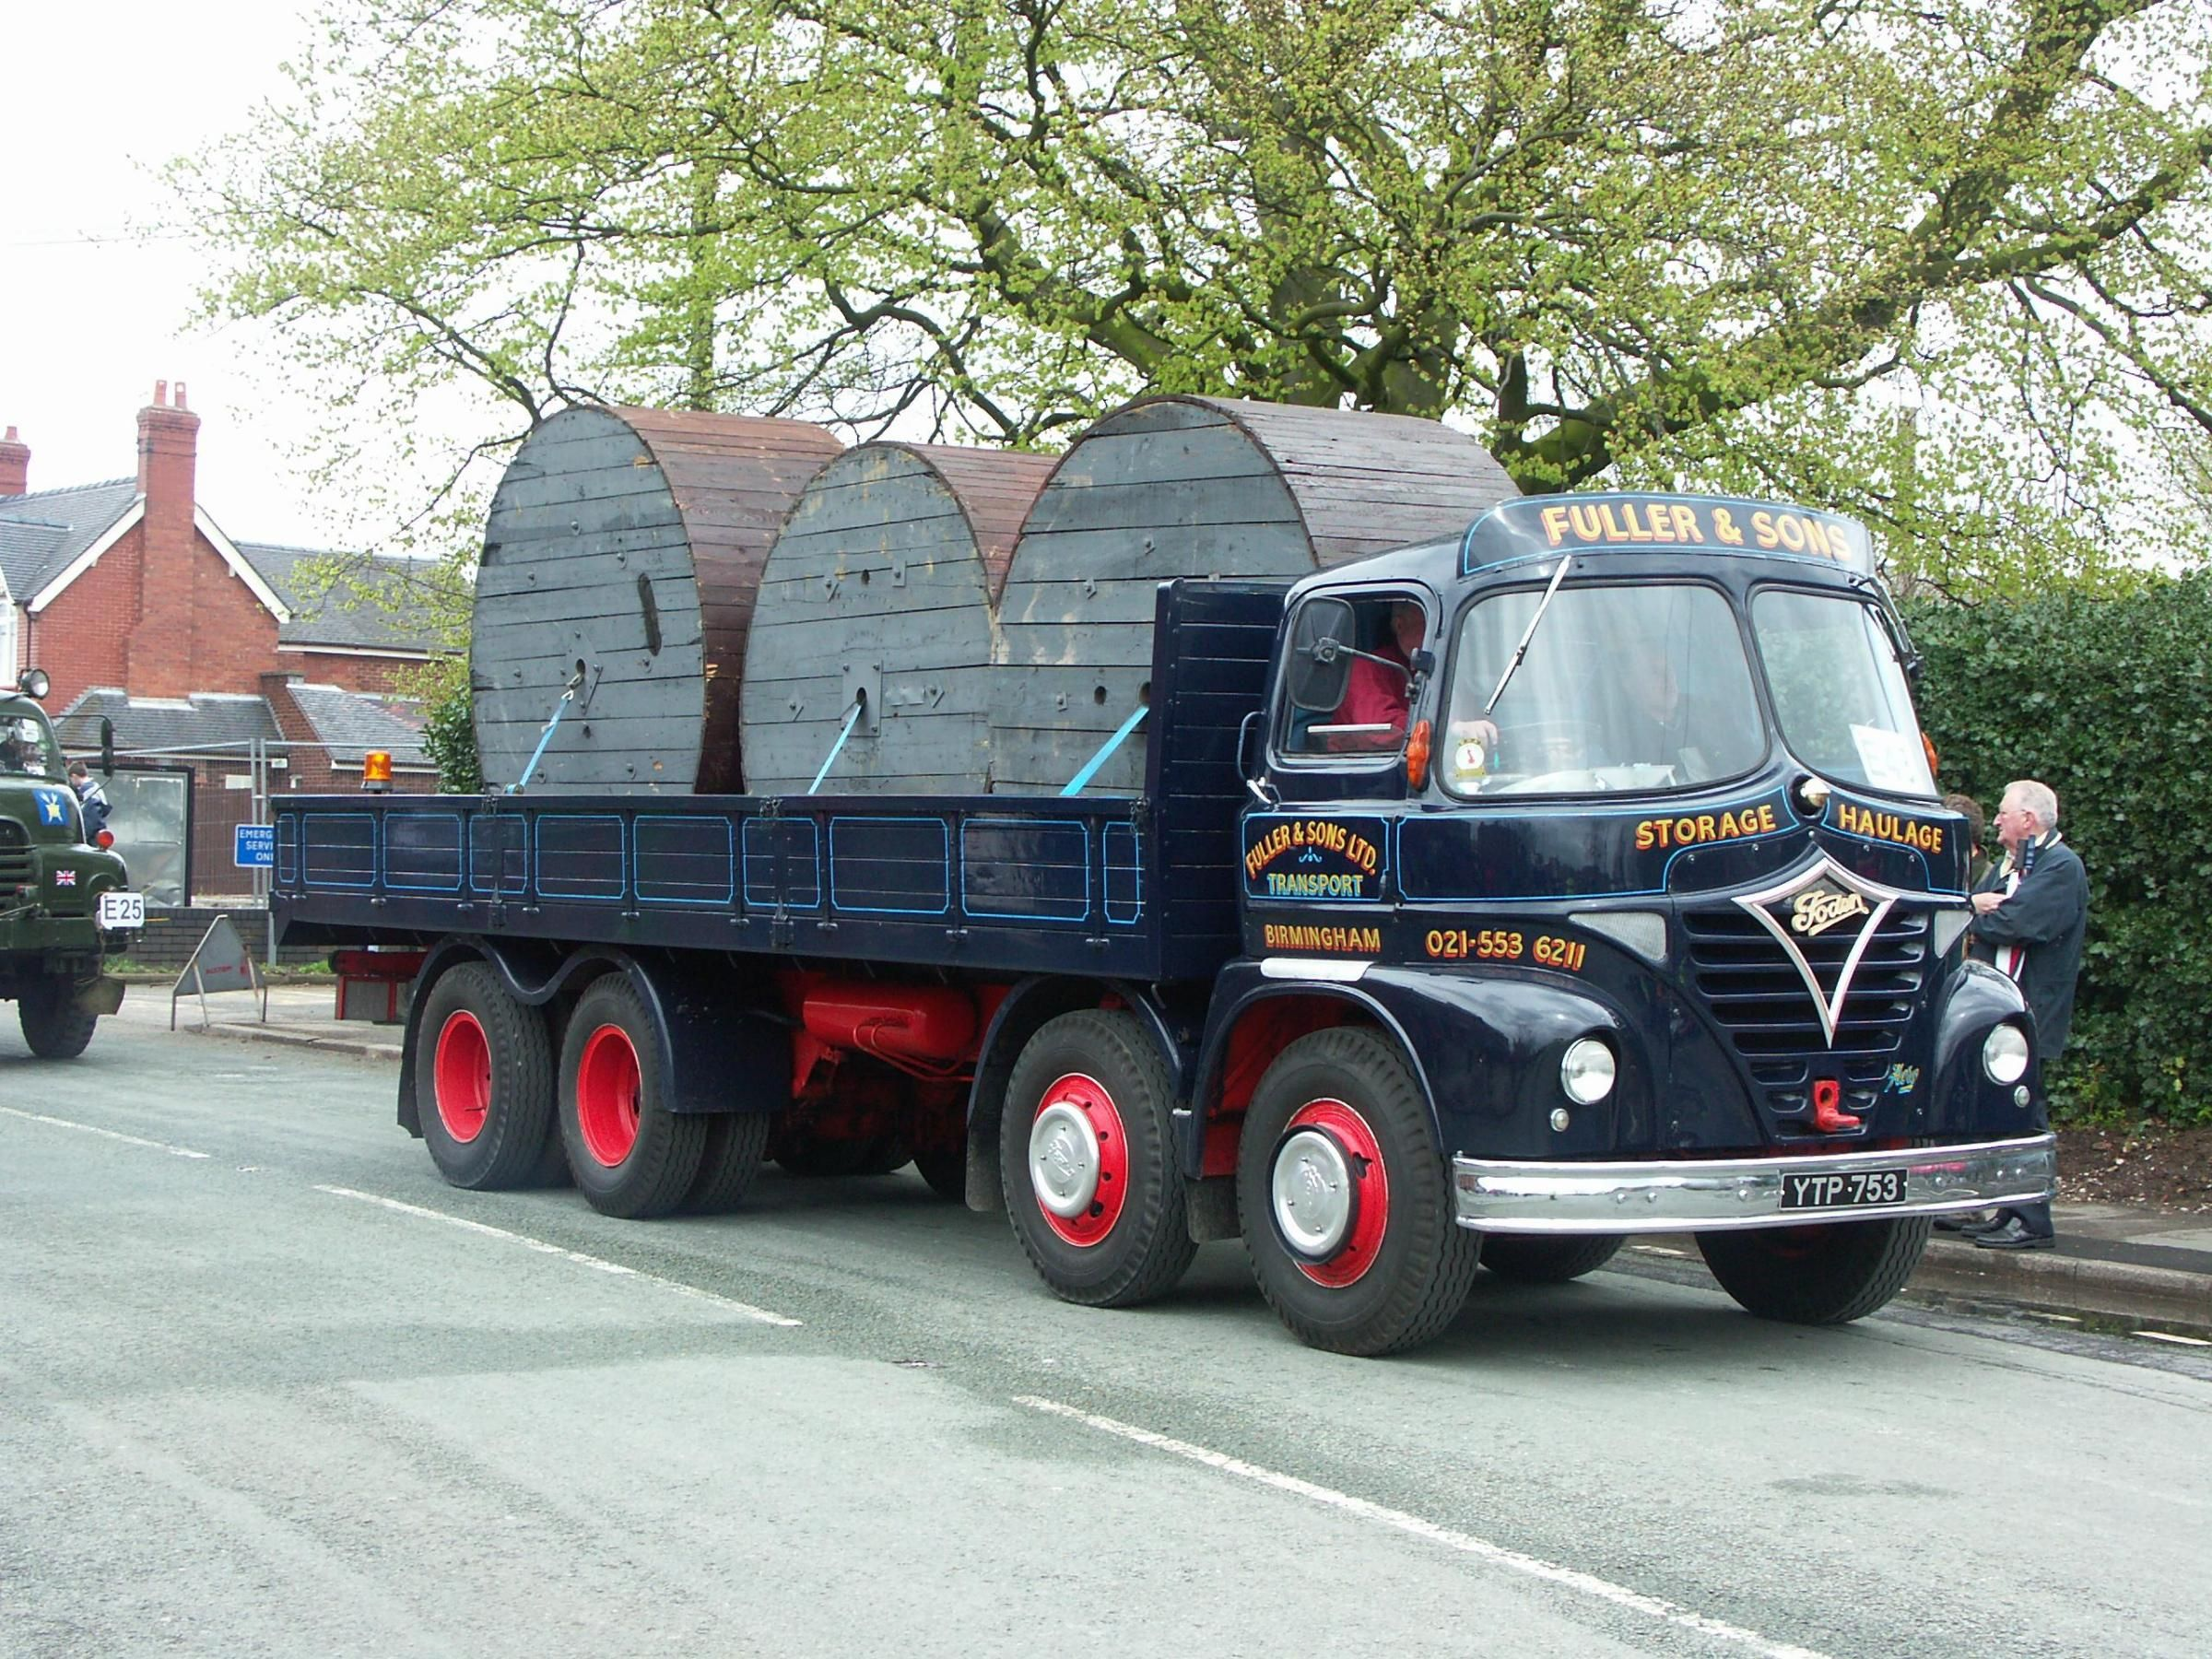 Pin by Bernard Toulgoat on British mercial vehicles Lorry truck